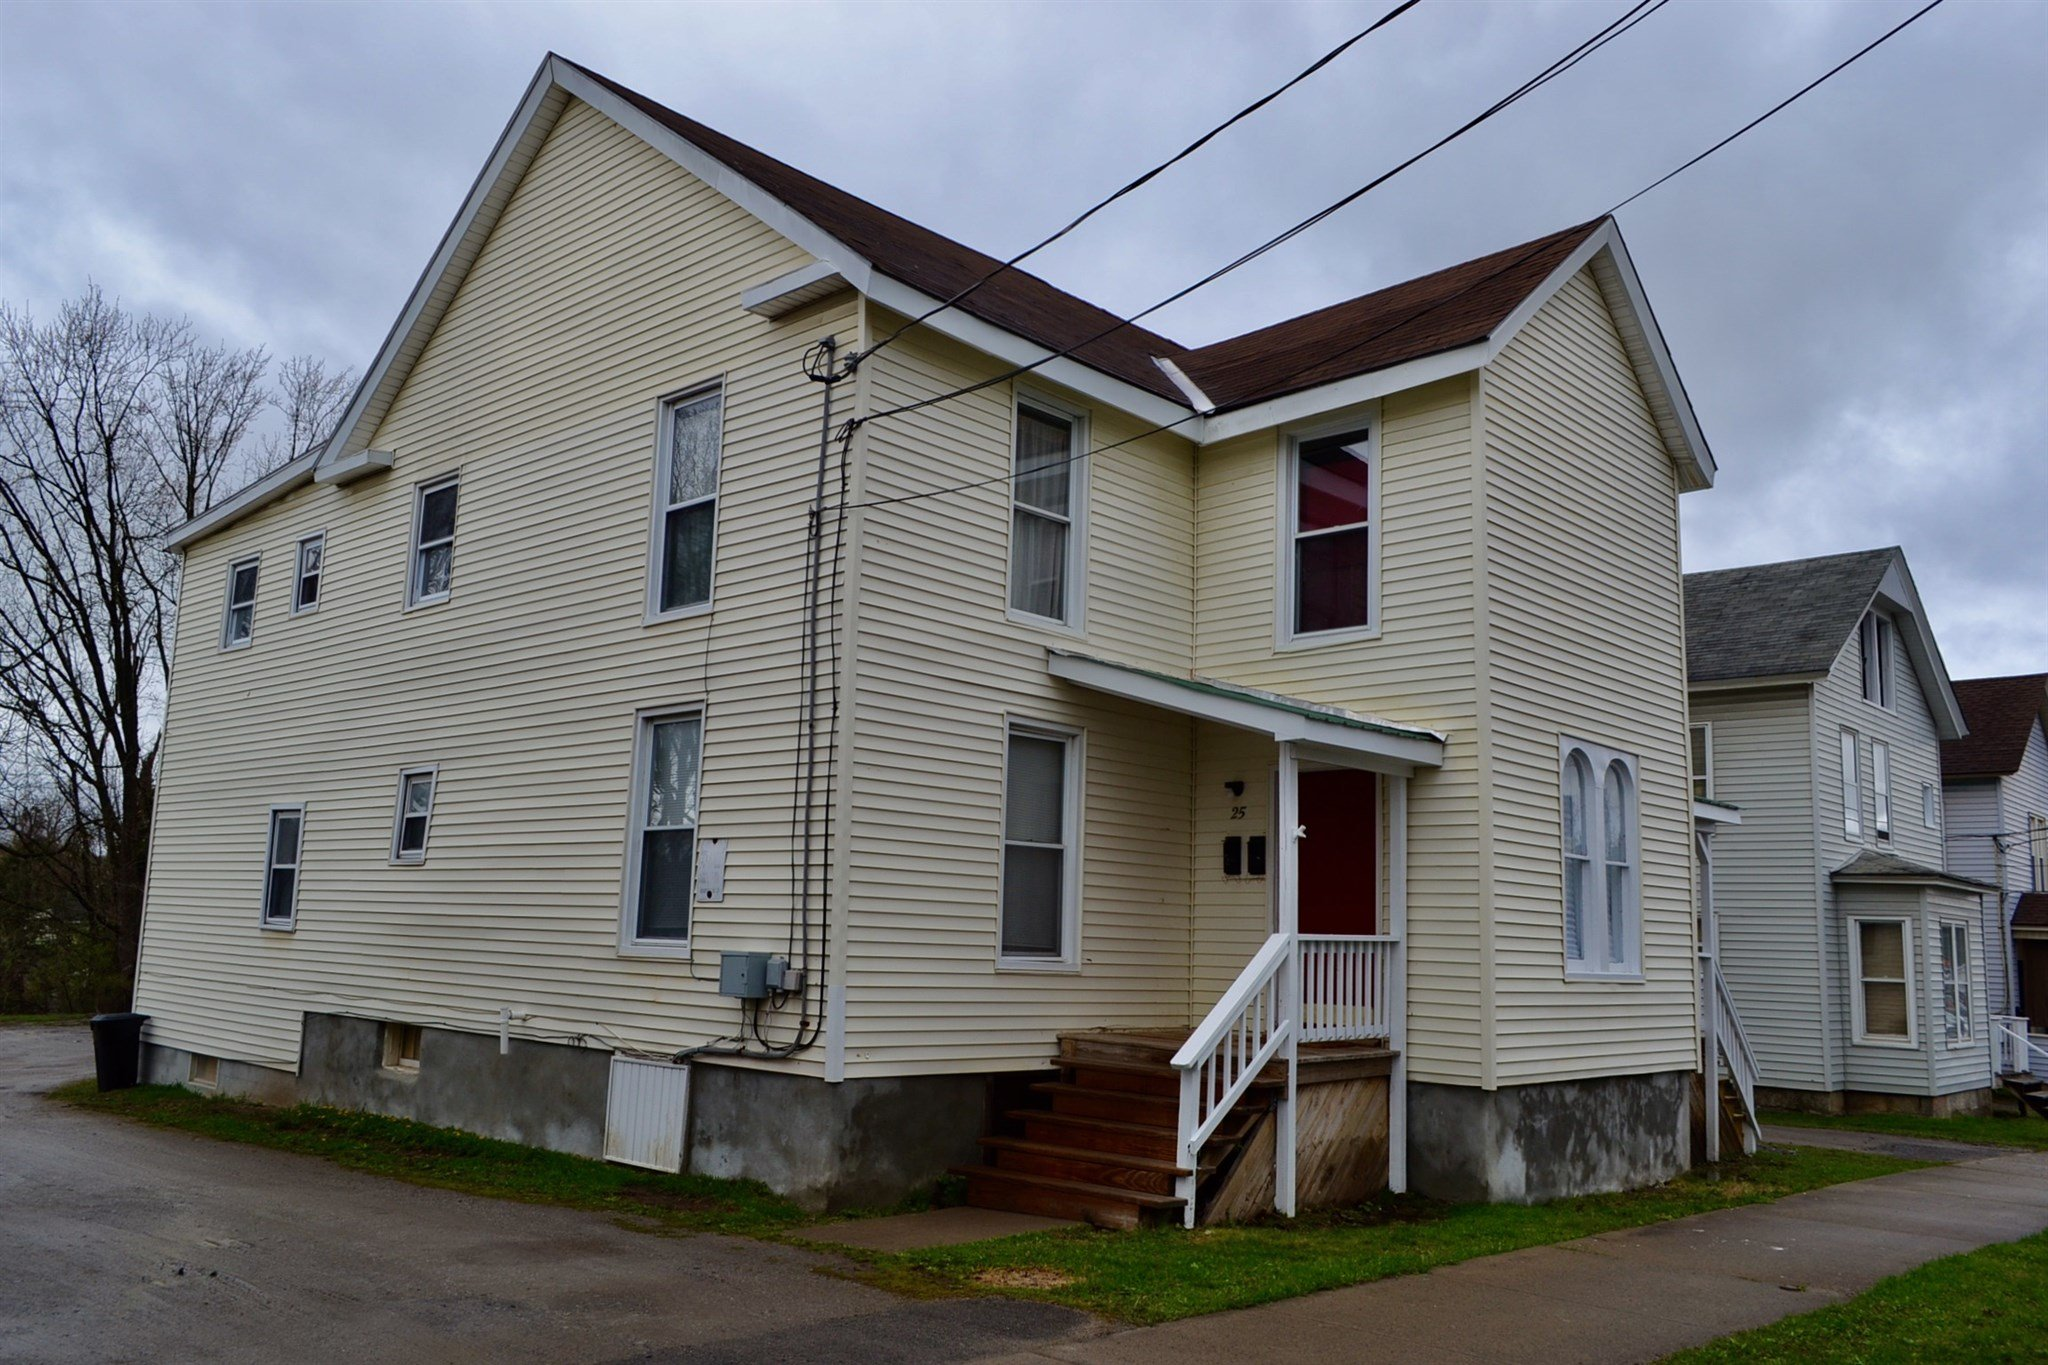 Johnstown image 41